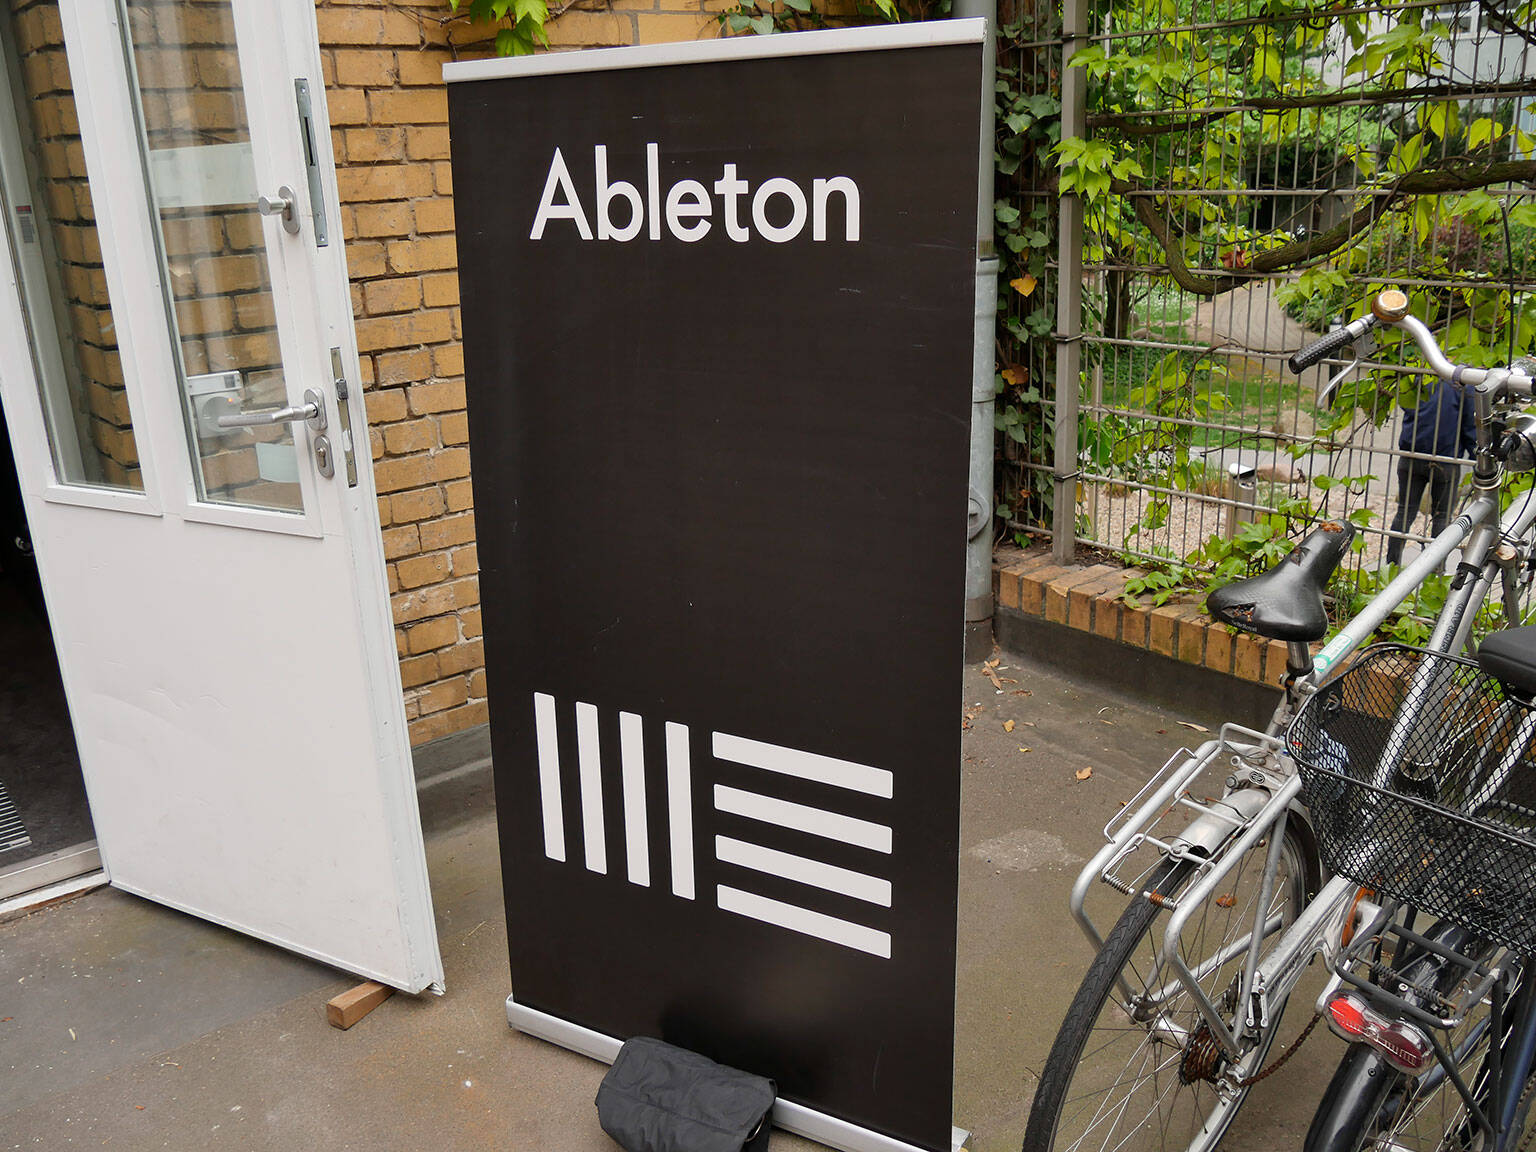 20190508SB19_arrival_ableton_12_